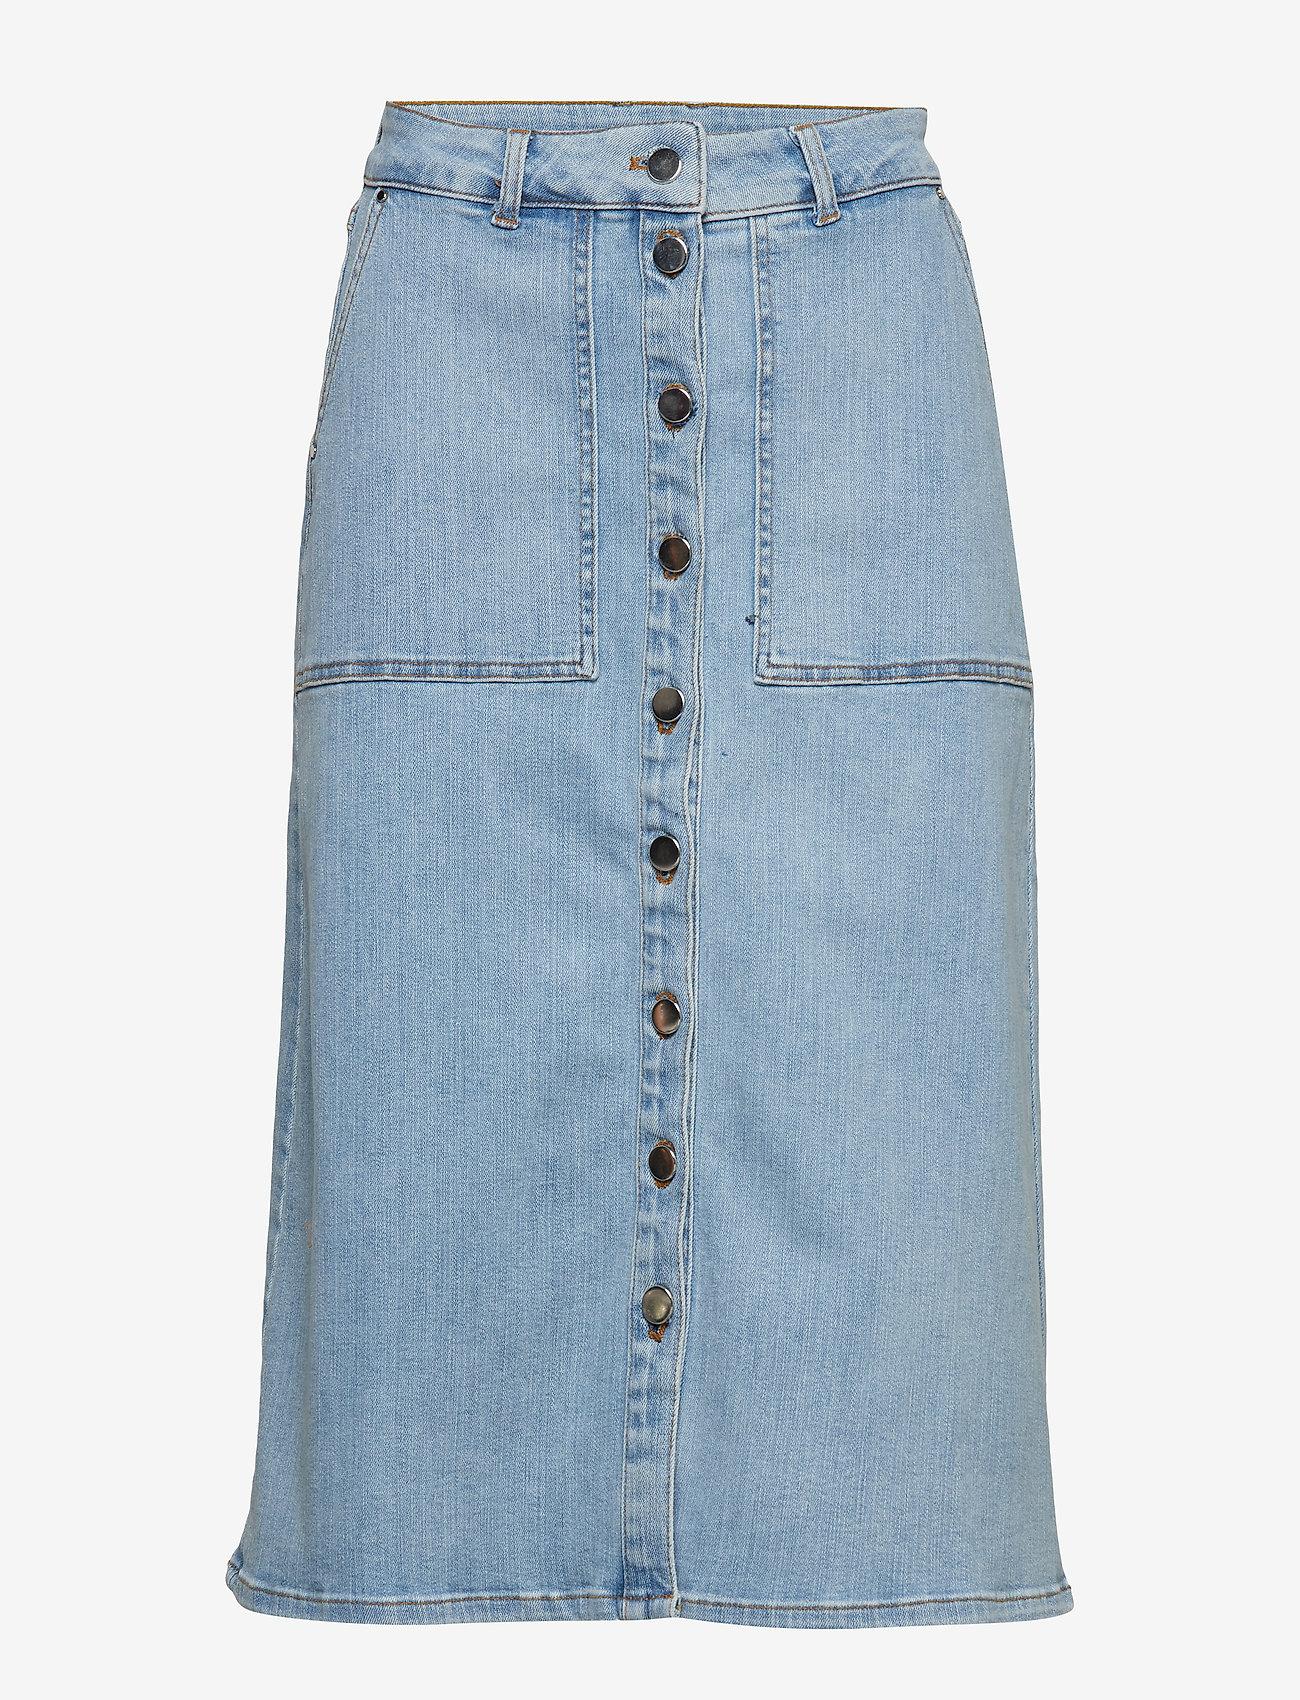 Stella Nova - Wenya - jupes en jeans - solitude blue